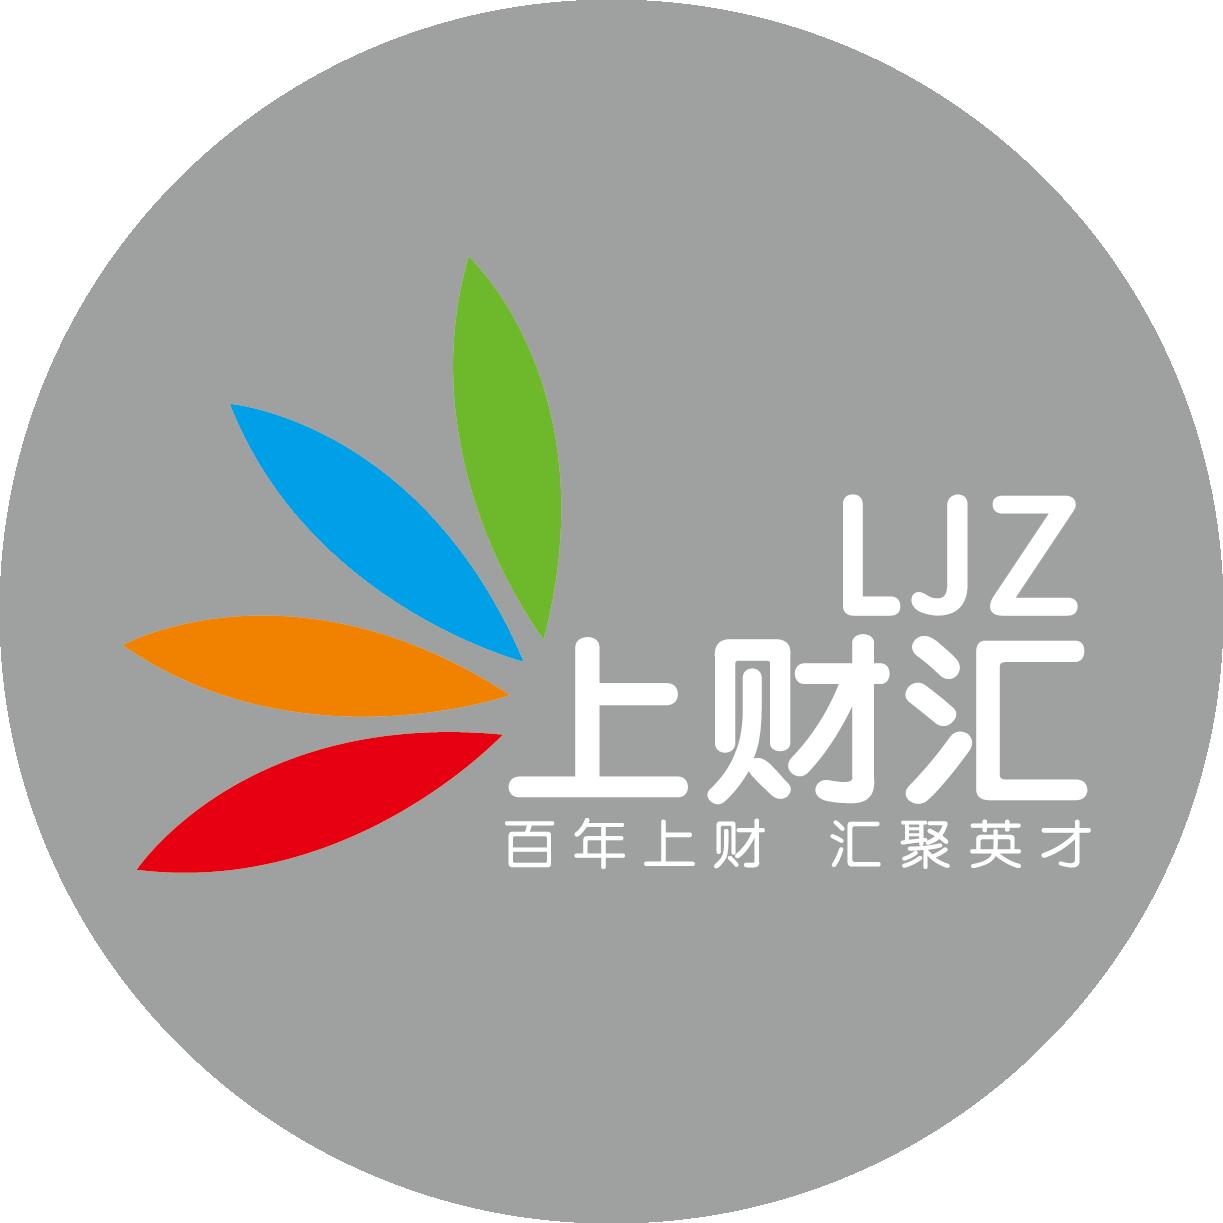 上财汇logo Grey.png